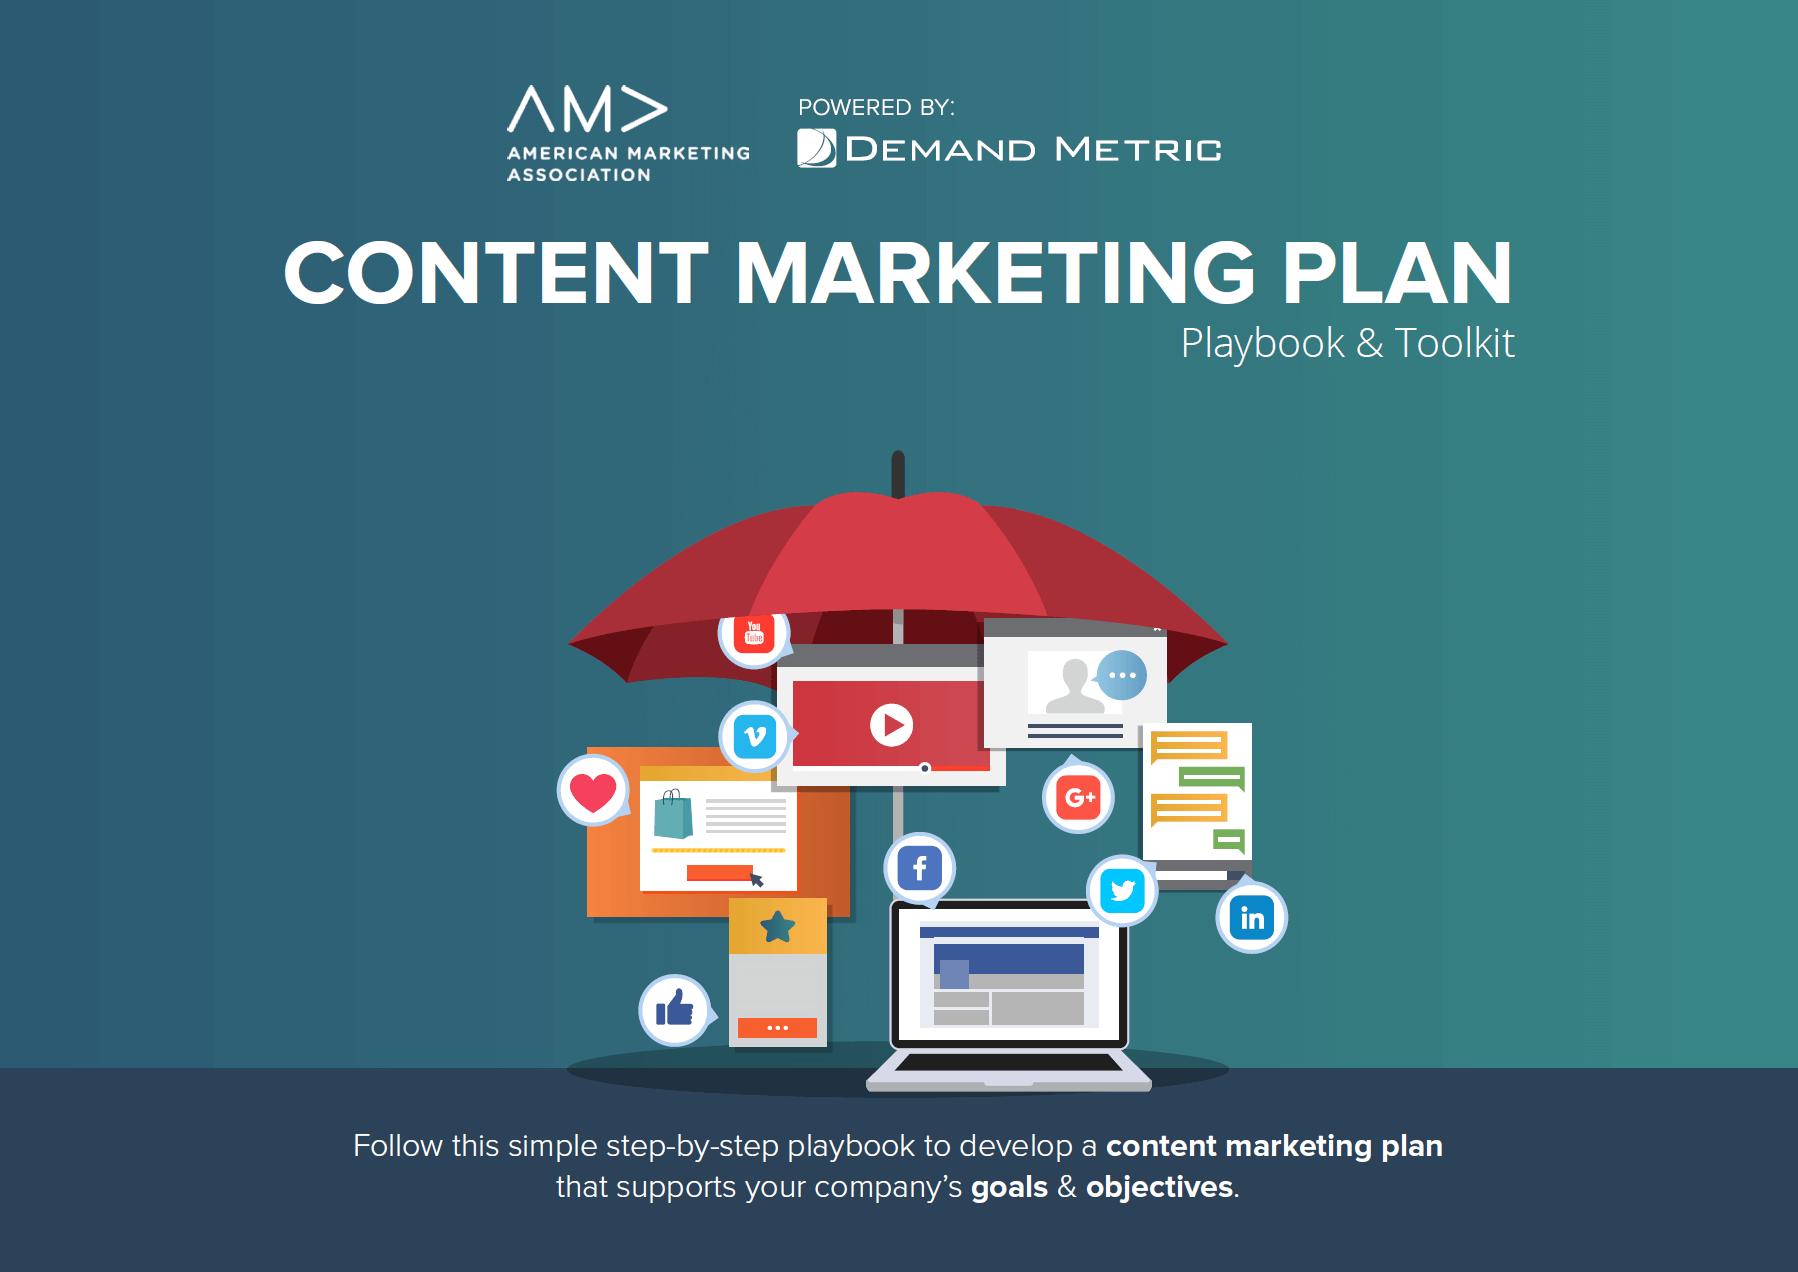 AMA content marketing plan